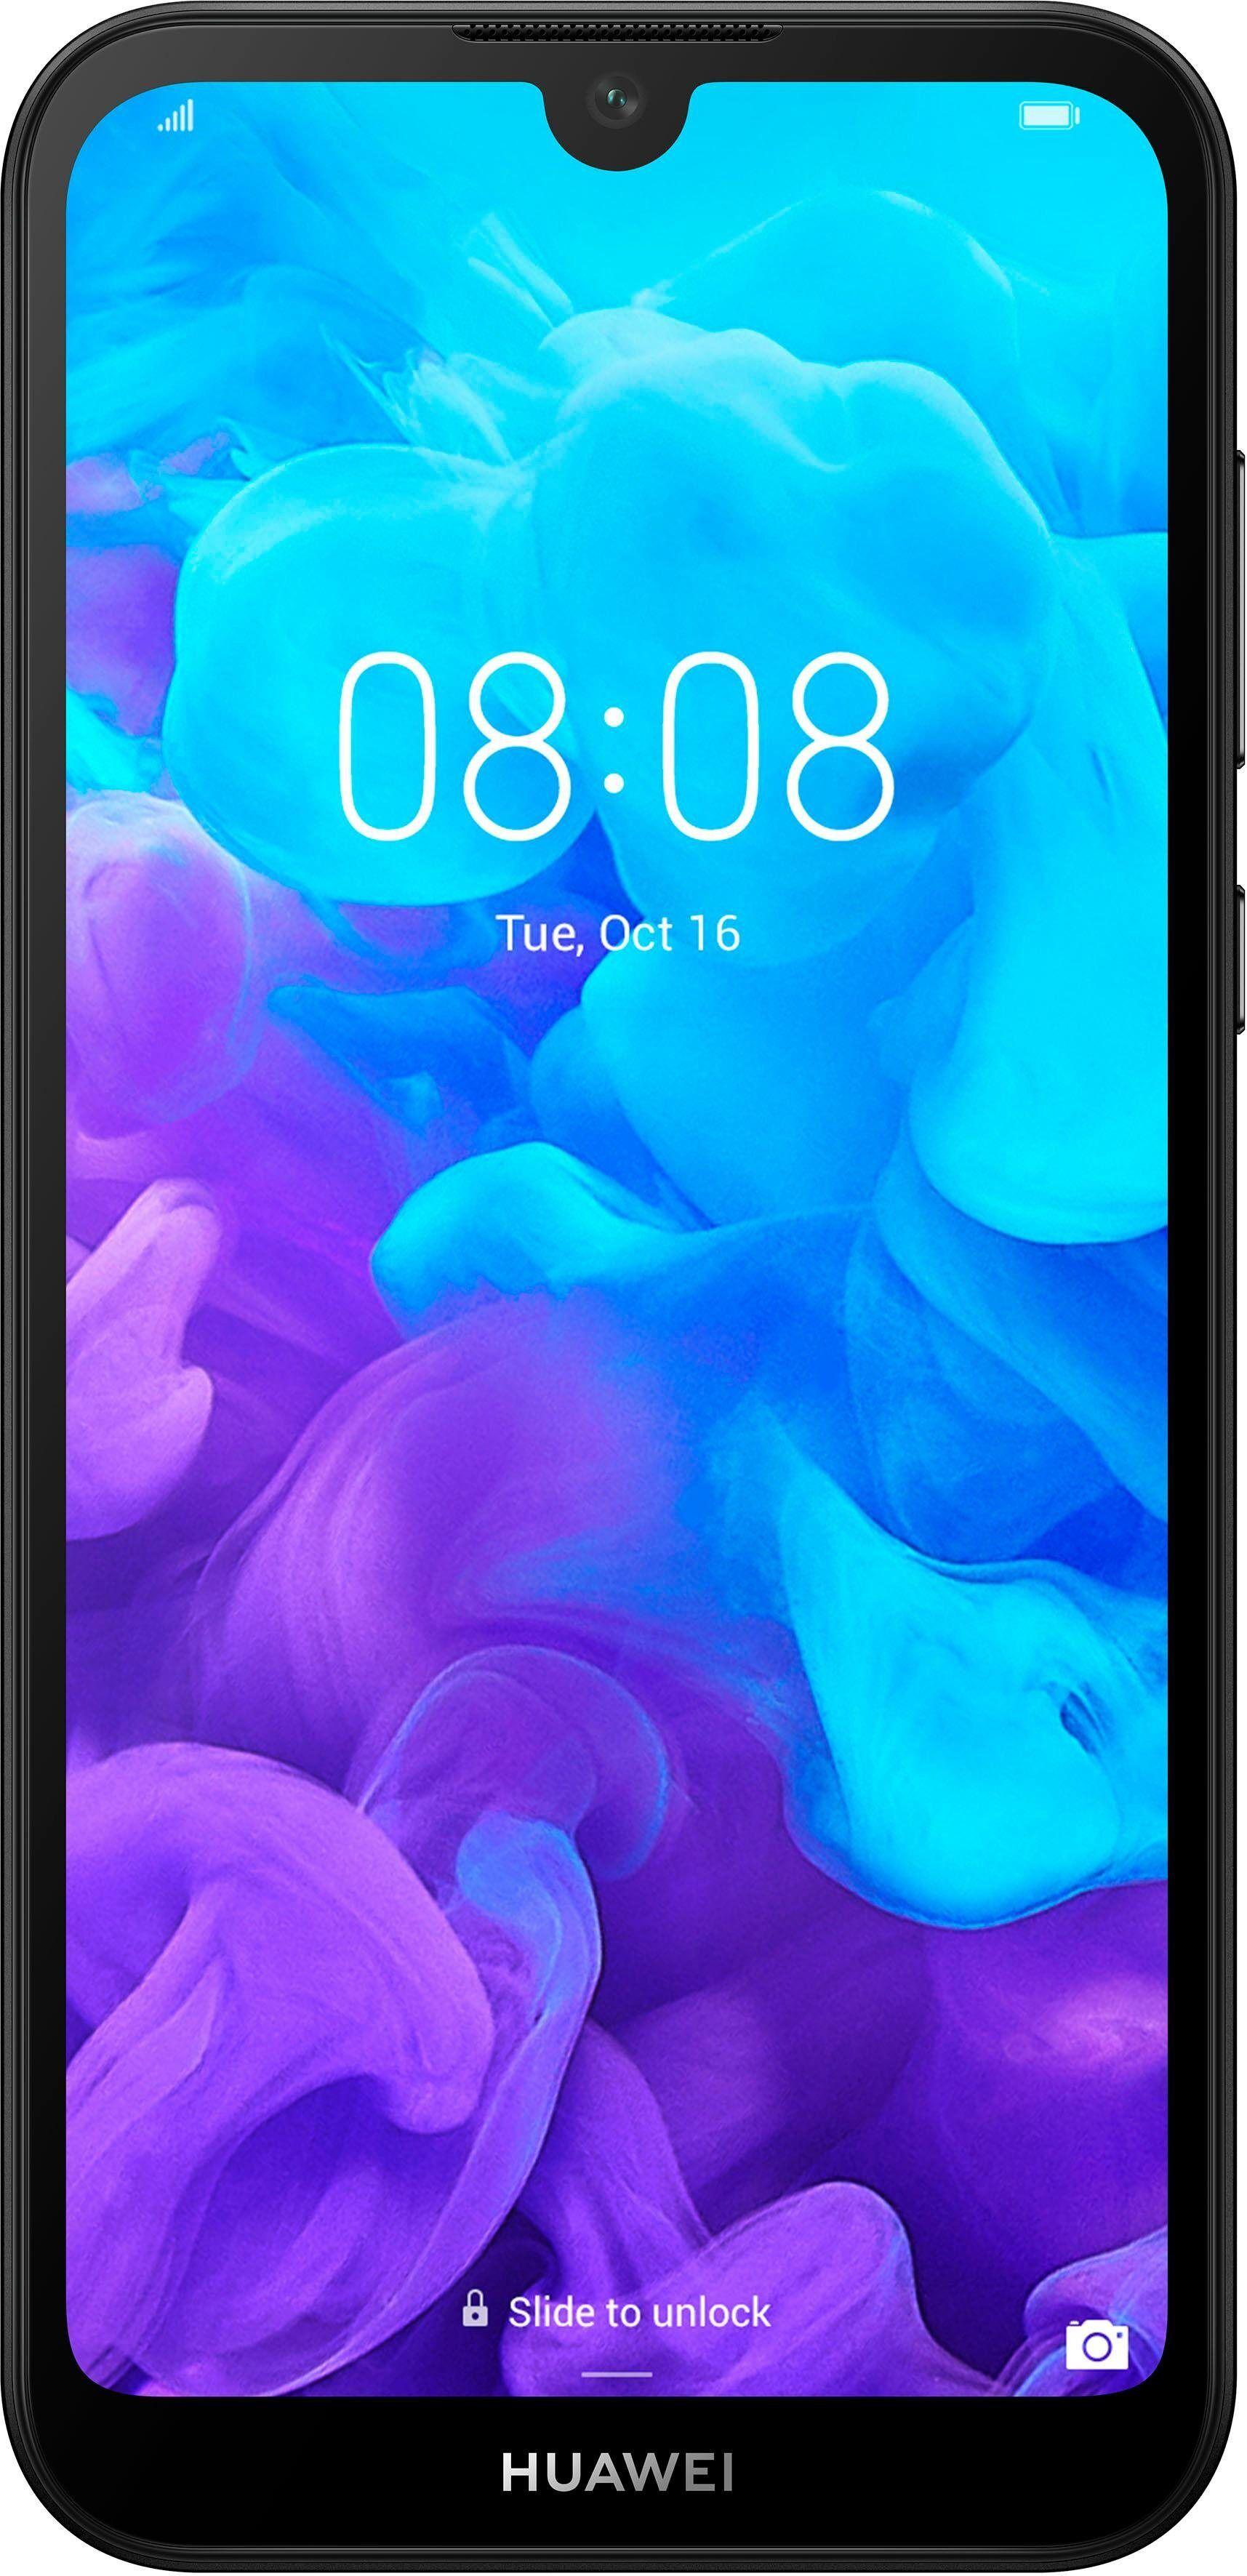 Huawei Y5 2019 Smartphone (14,5 cm/5,7 Zoll, 16 GB Speicherplatz, 13 MP Kamera), Midnight Black